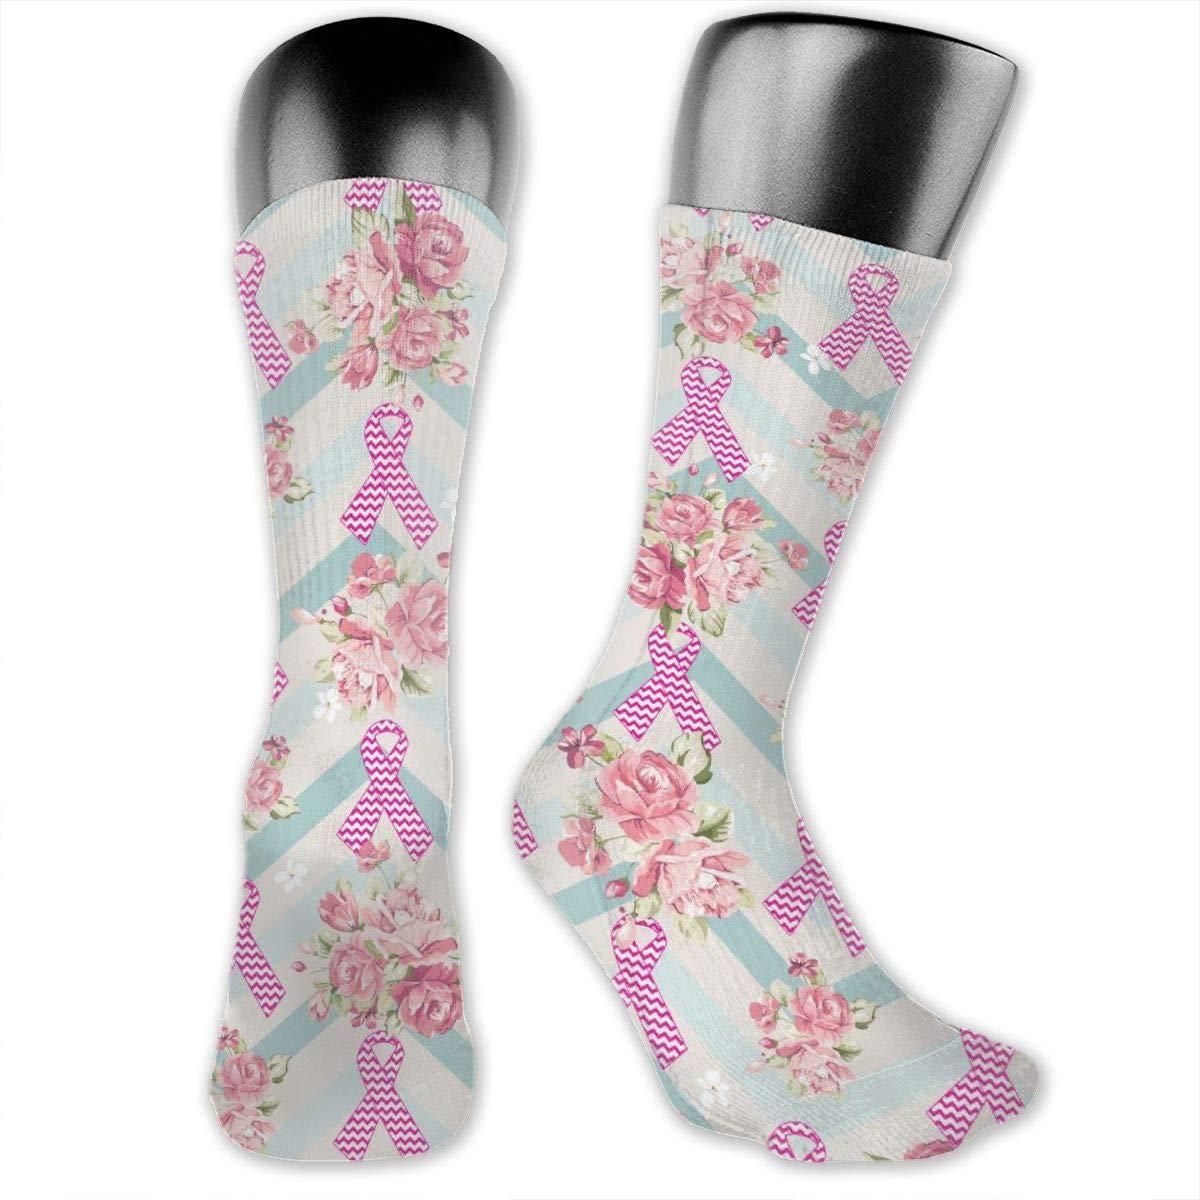 Personalized Breast Cancer Awareness Butterfly Dress Socks For Women Men